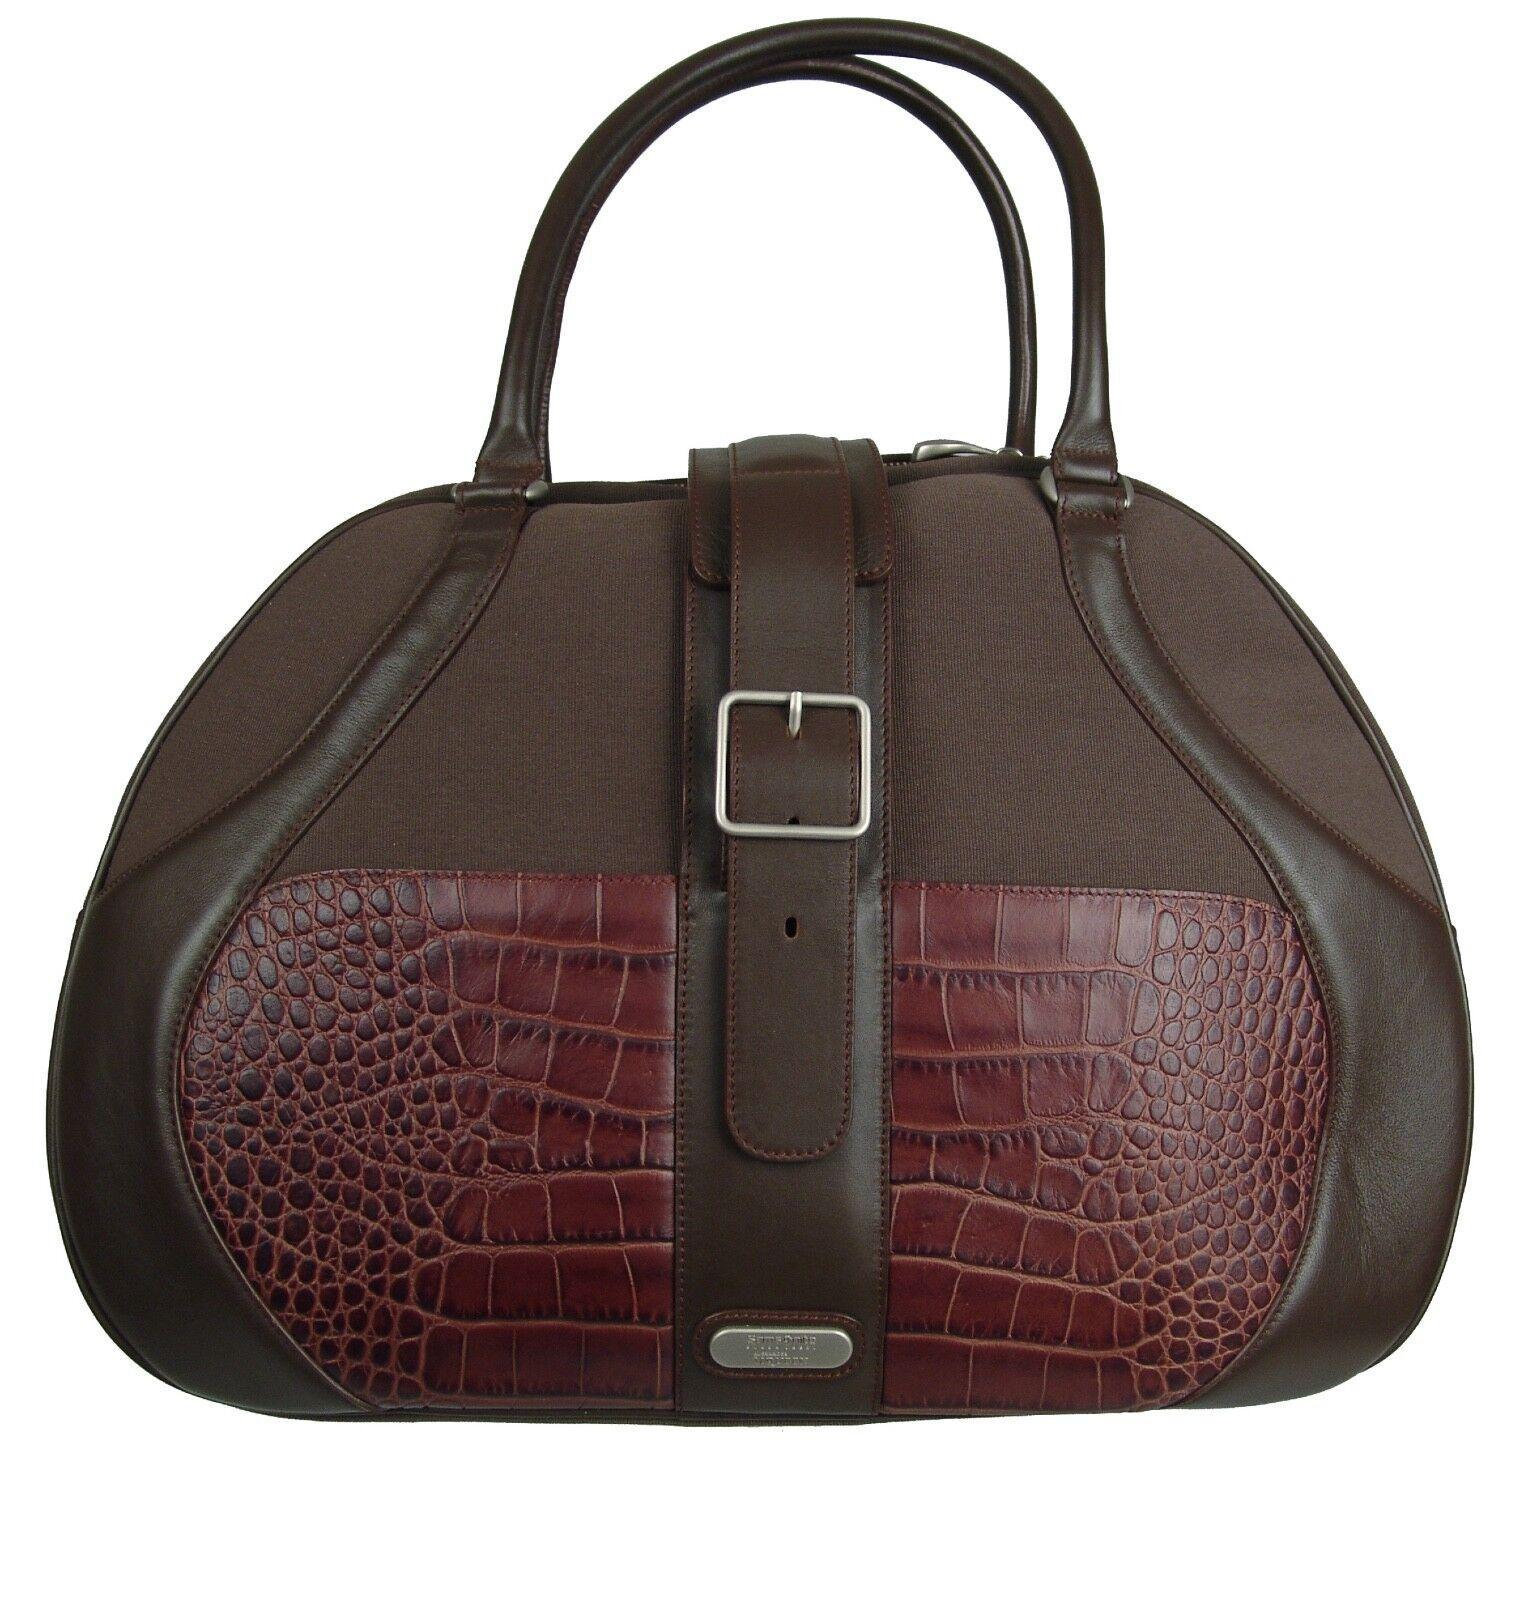 Samsonite Black Label Brown McQueen Women's Boarding Bag Lea